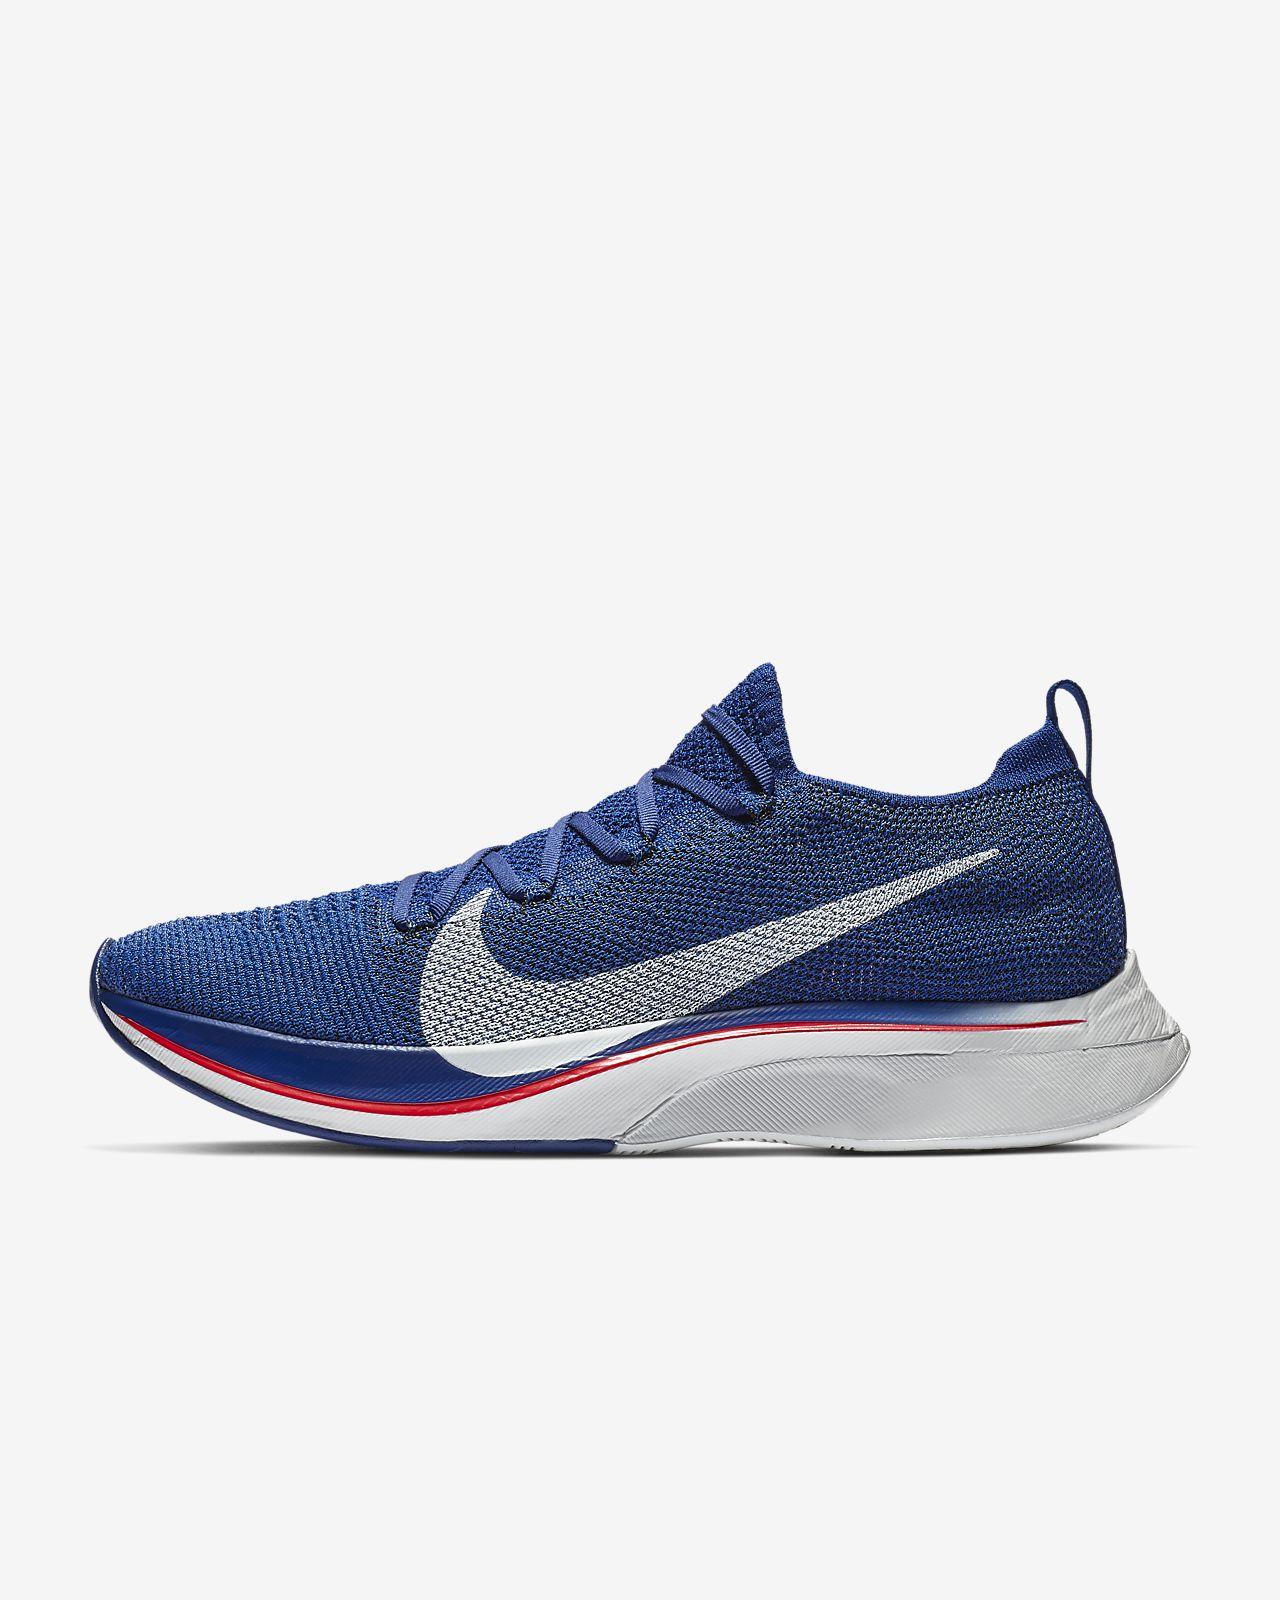 san francisco 737b4 2023b ... Chaussure de running Nike Vaporfly 4% Flyknit